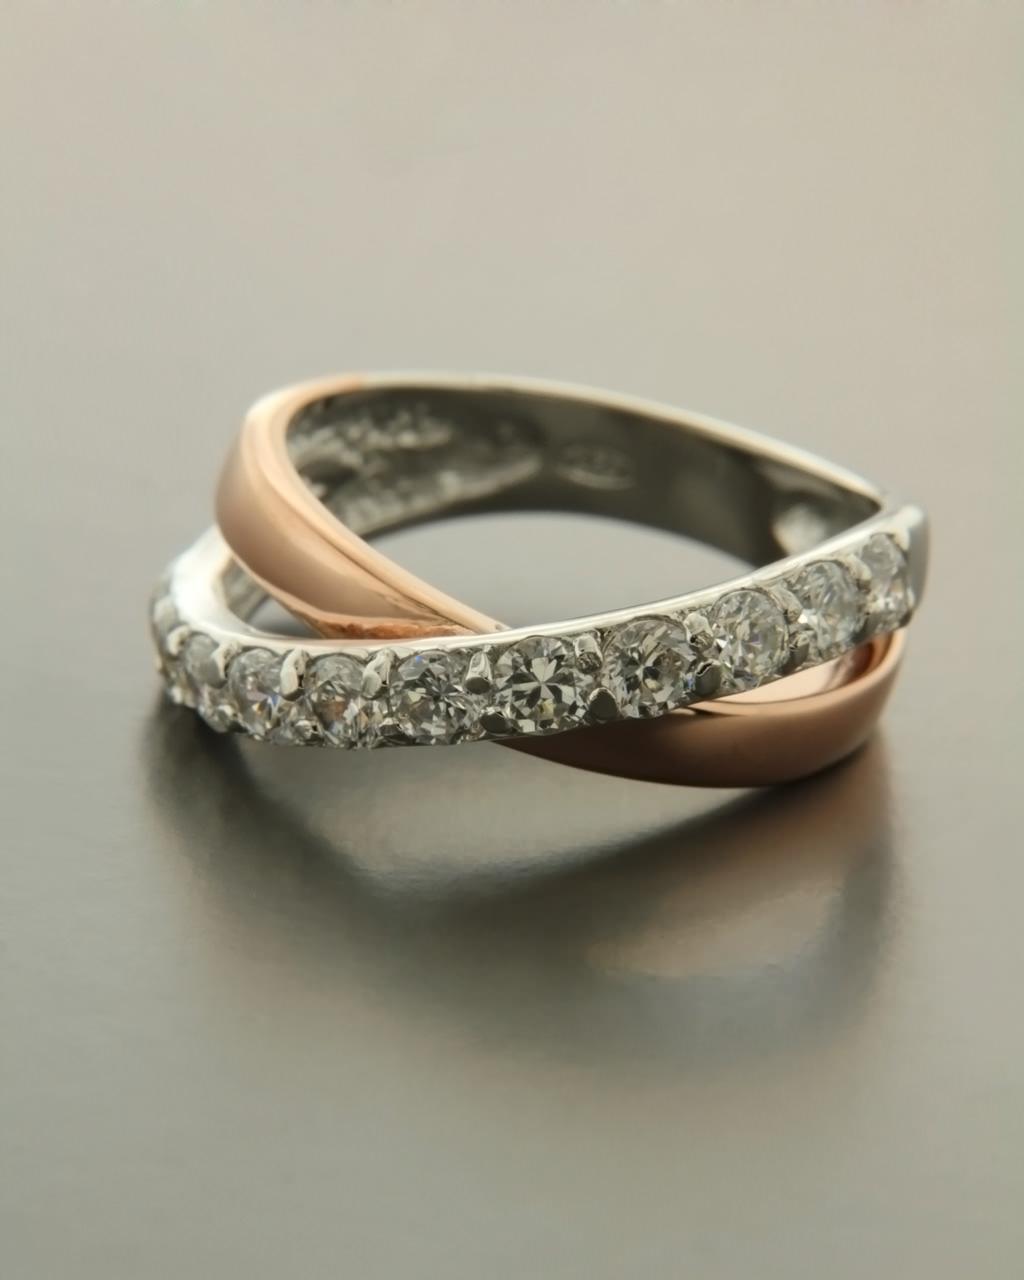 339cf1f102 Δαχτυλίδι ασημένιο 925 με Ζιργκόν